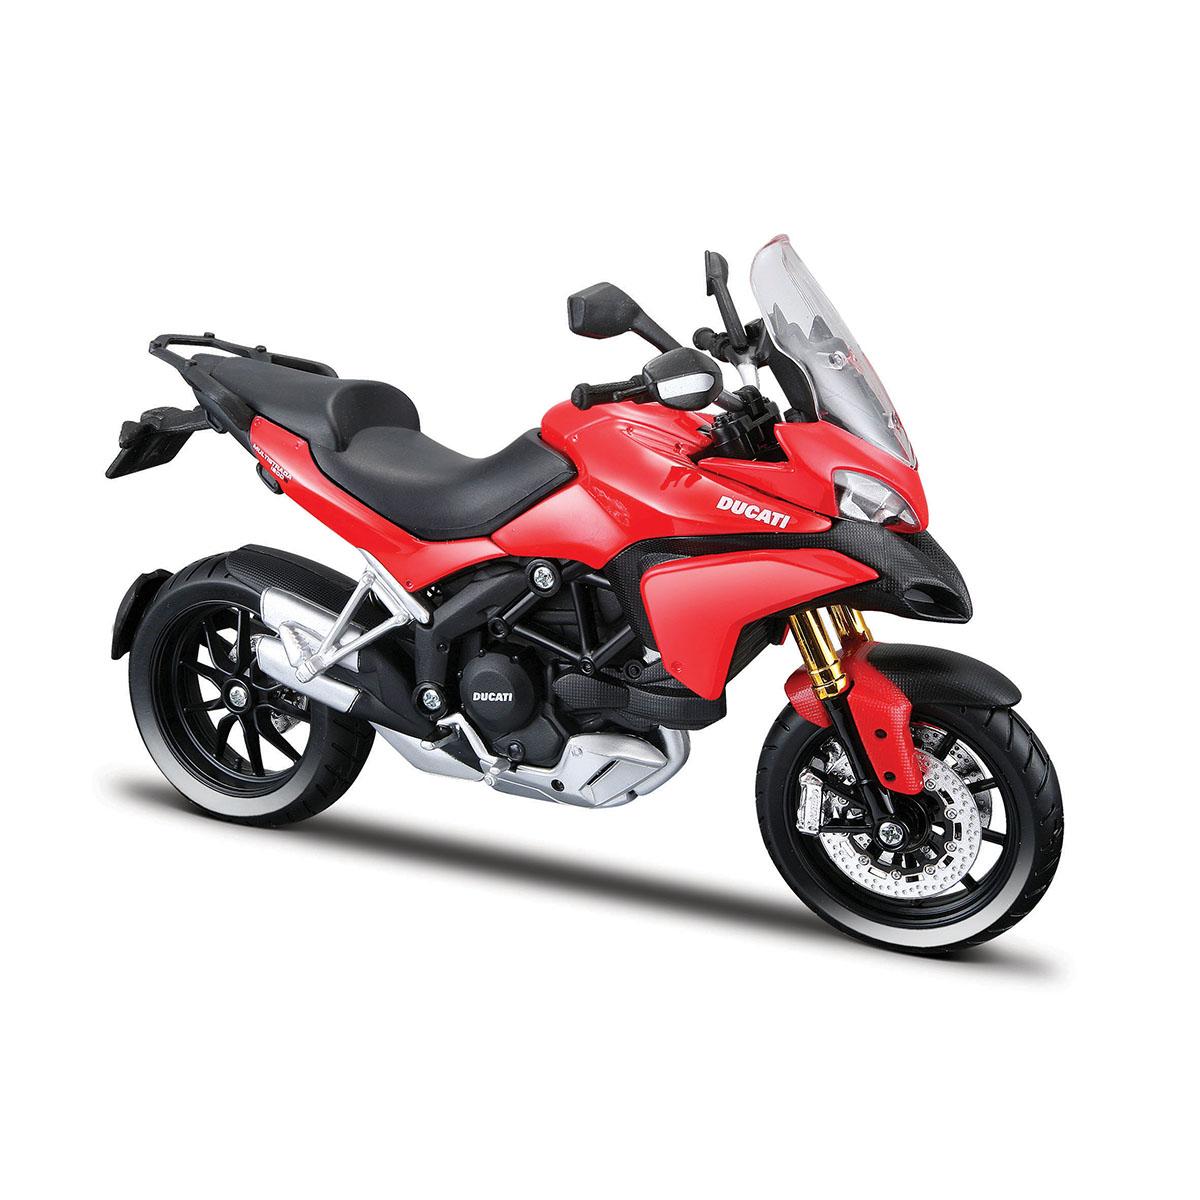 Motocicleta Maisto Ducati Multistrada, Rosu, 1:12